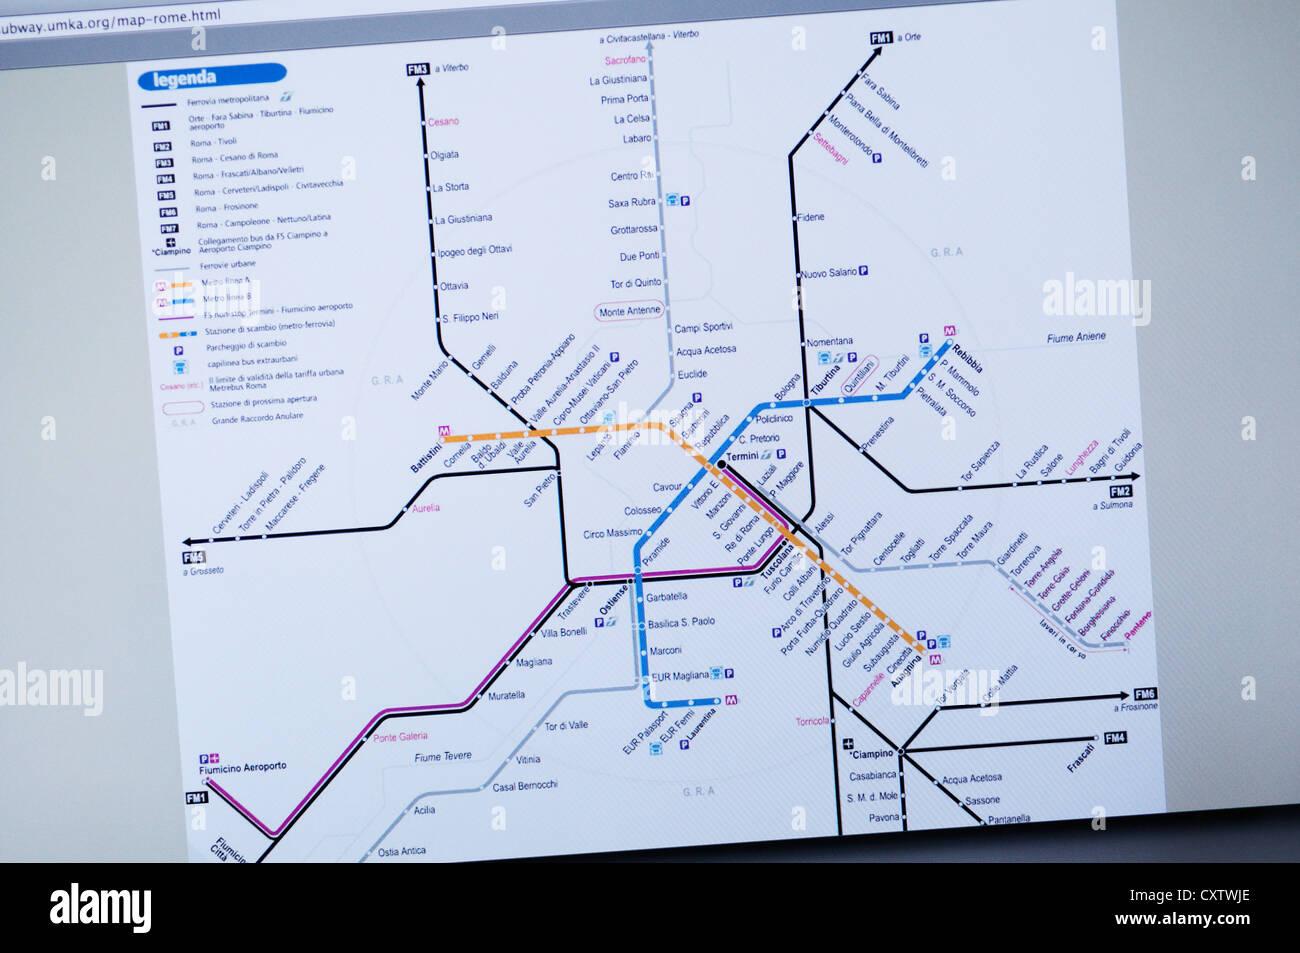 Rome Italy Subway Map.Subway Map Rome Italy Stock Photos Subway Map Rome Italy Stock